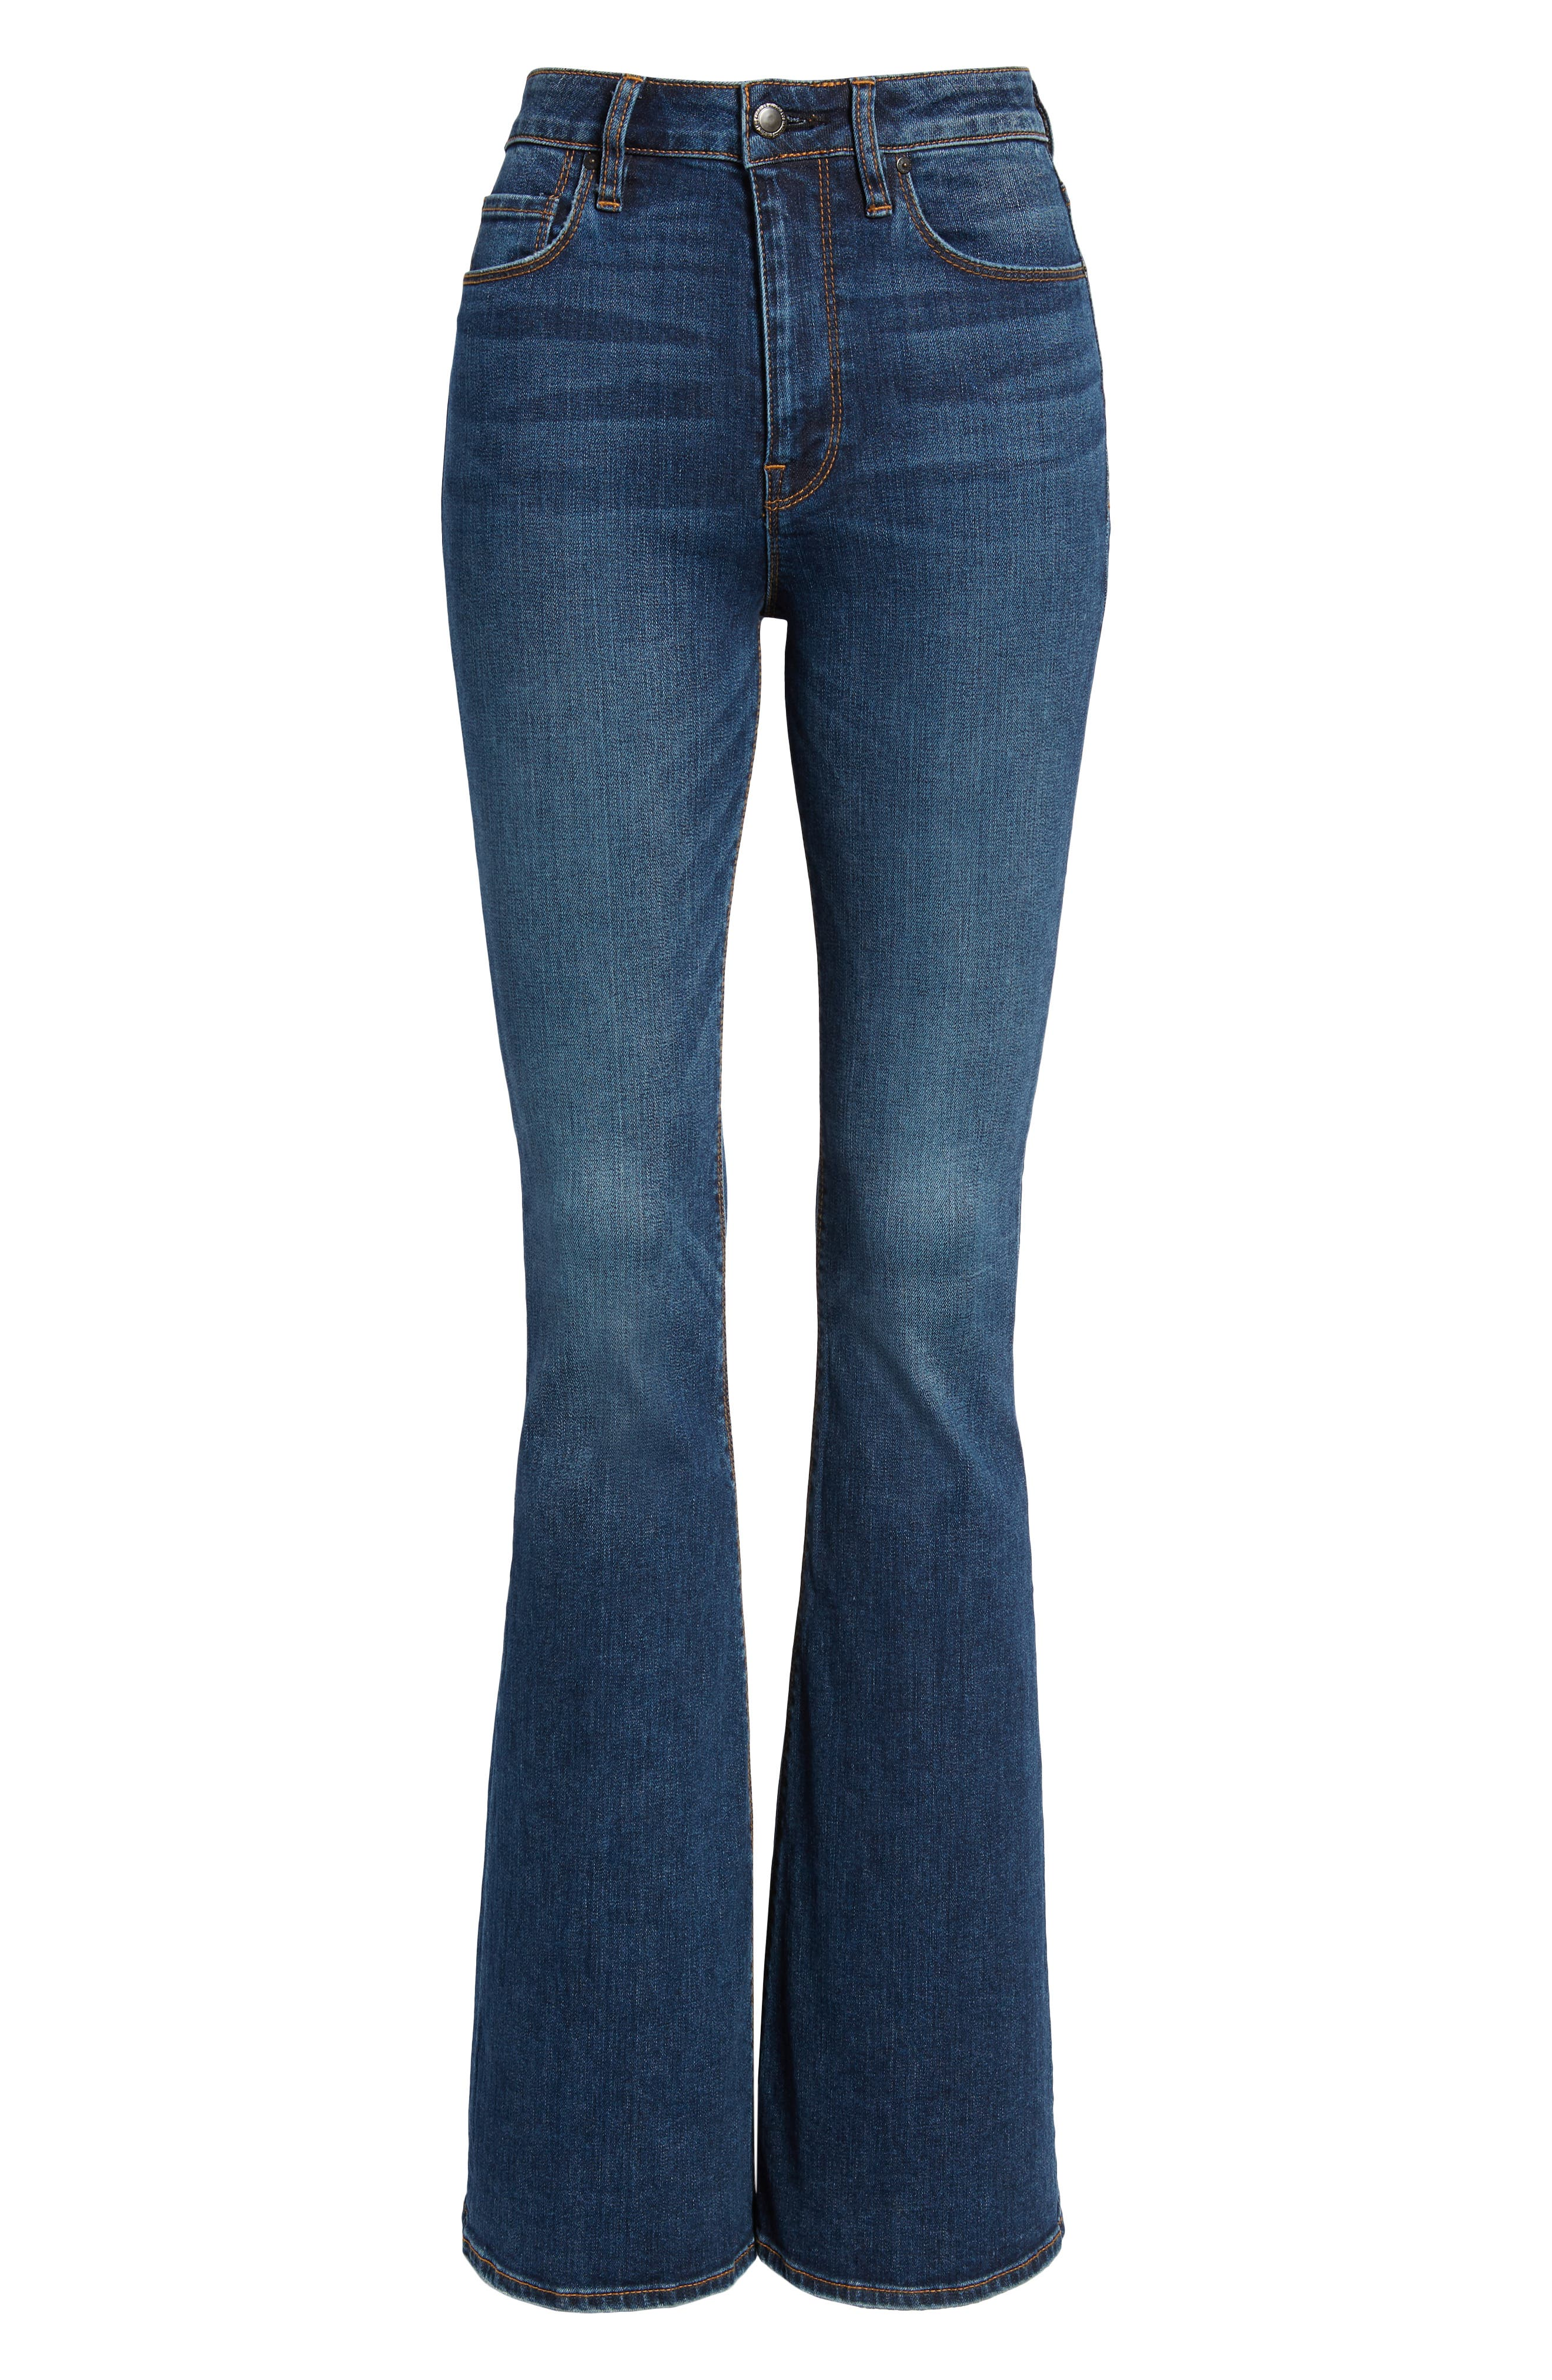 HUDSON JEANS, Holly High Waist Flare Jeans, Alternate thumbnail 7, color, VAGABOND